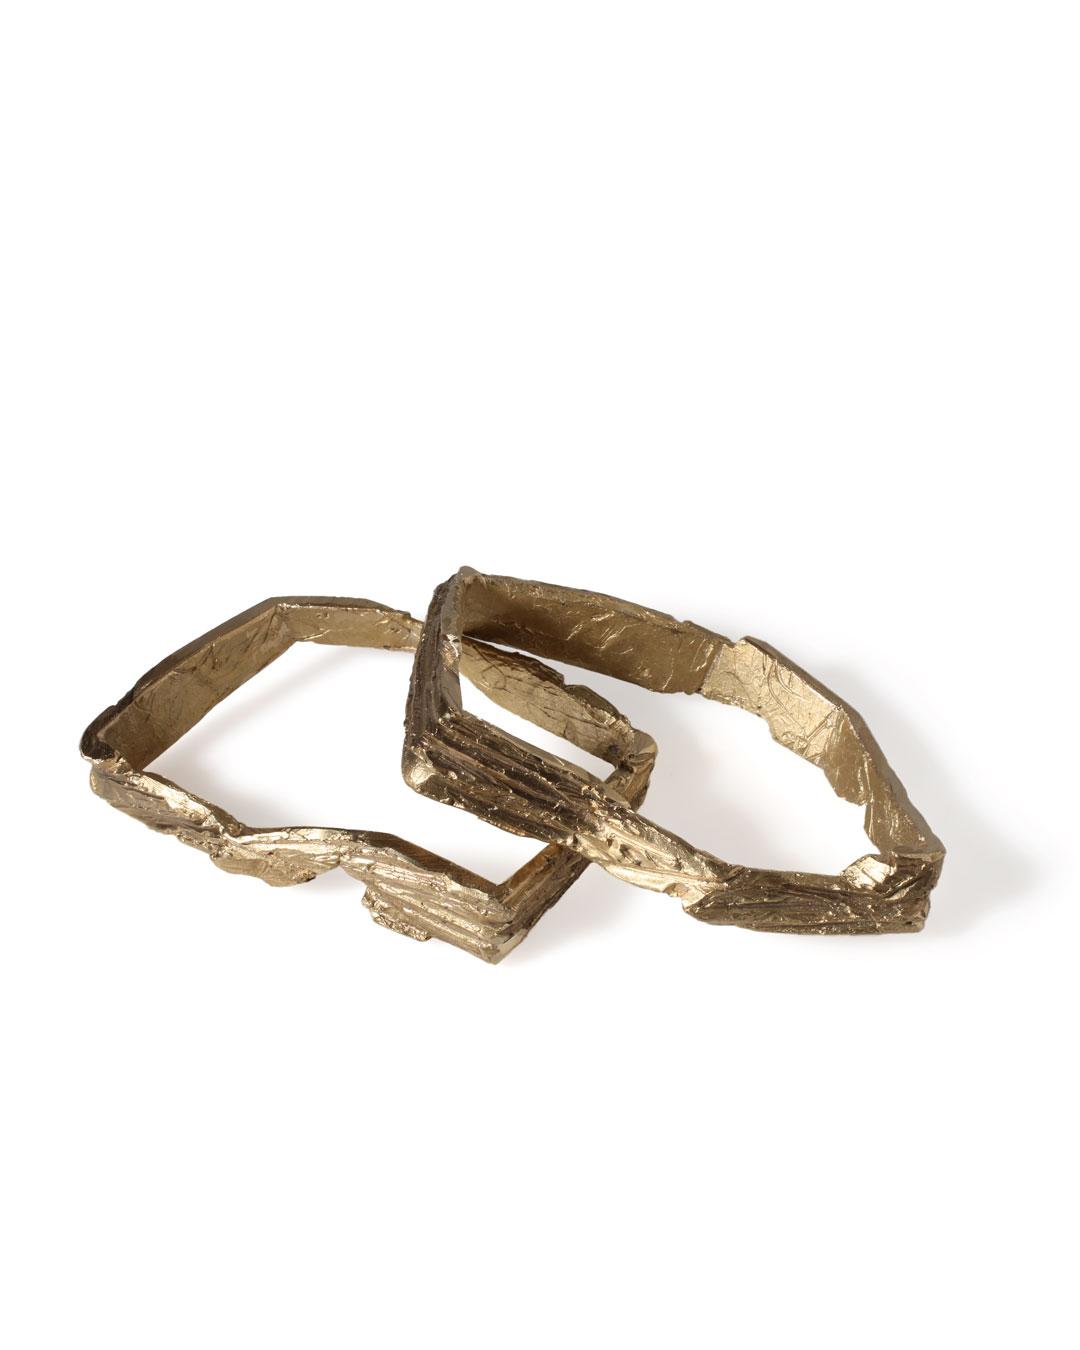 Juliane Brandes, zonder titel, 2013, armbanden; brons, 90 x 70 x 20 mm, €680